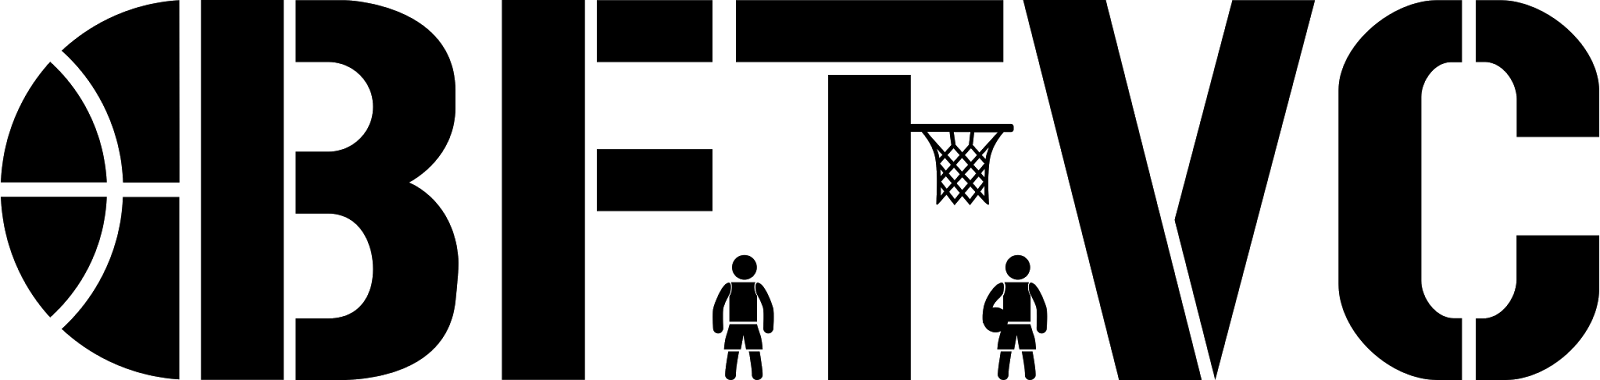 BFTVC-black-lg.png